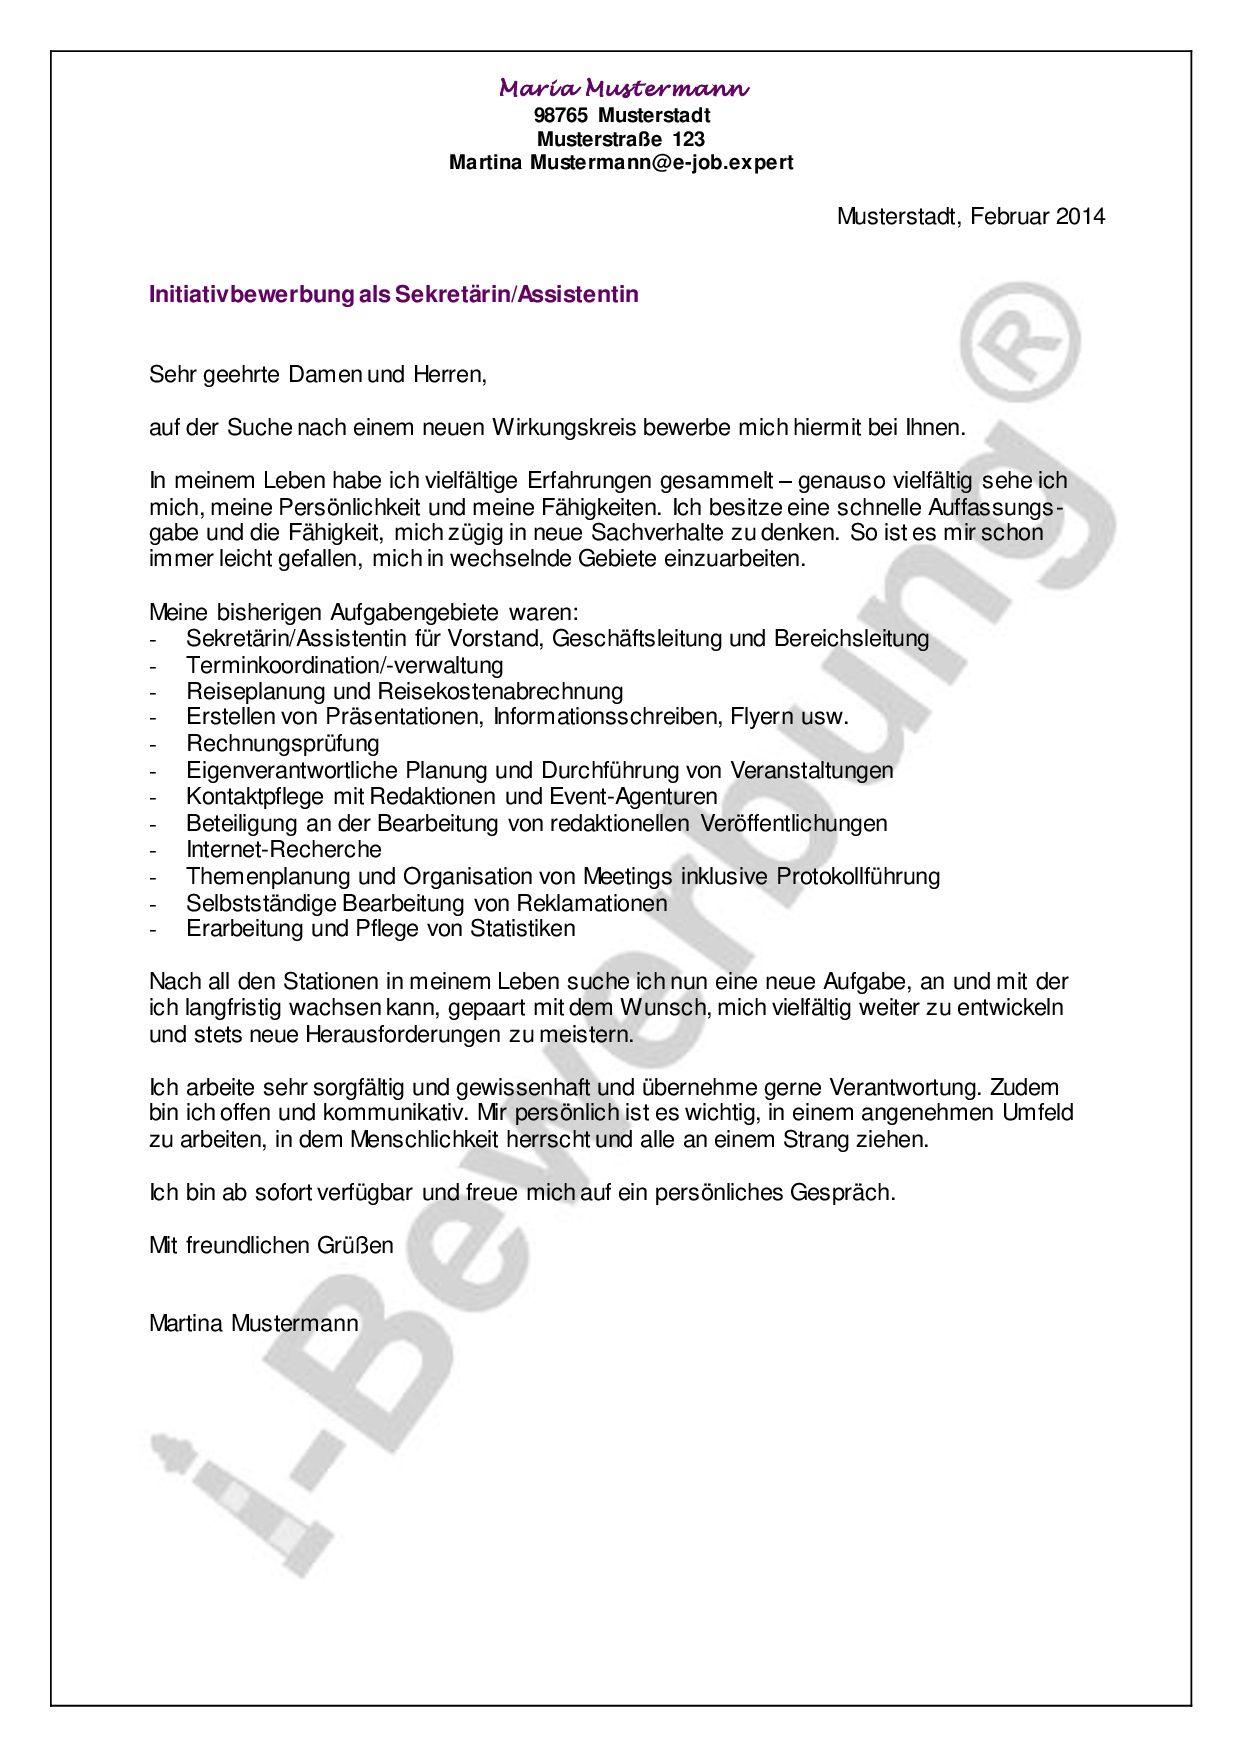 Anschreiben Bewerbung Sekretarin Muster Zum Download 3